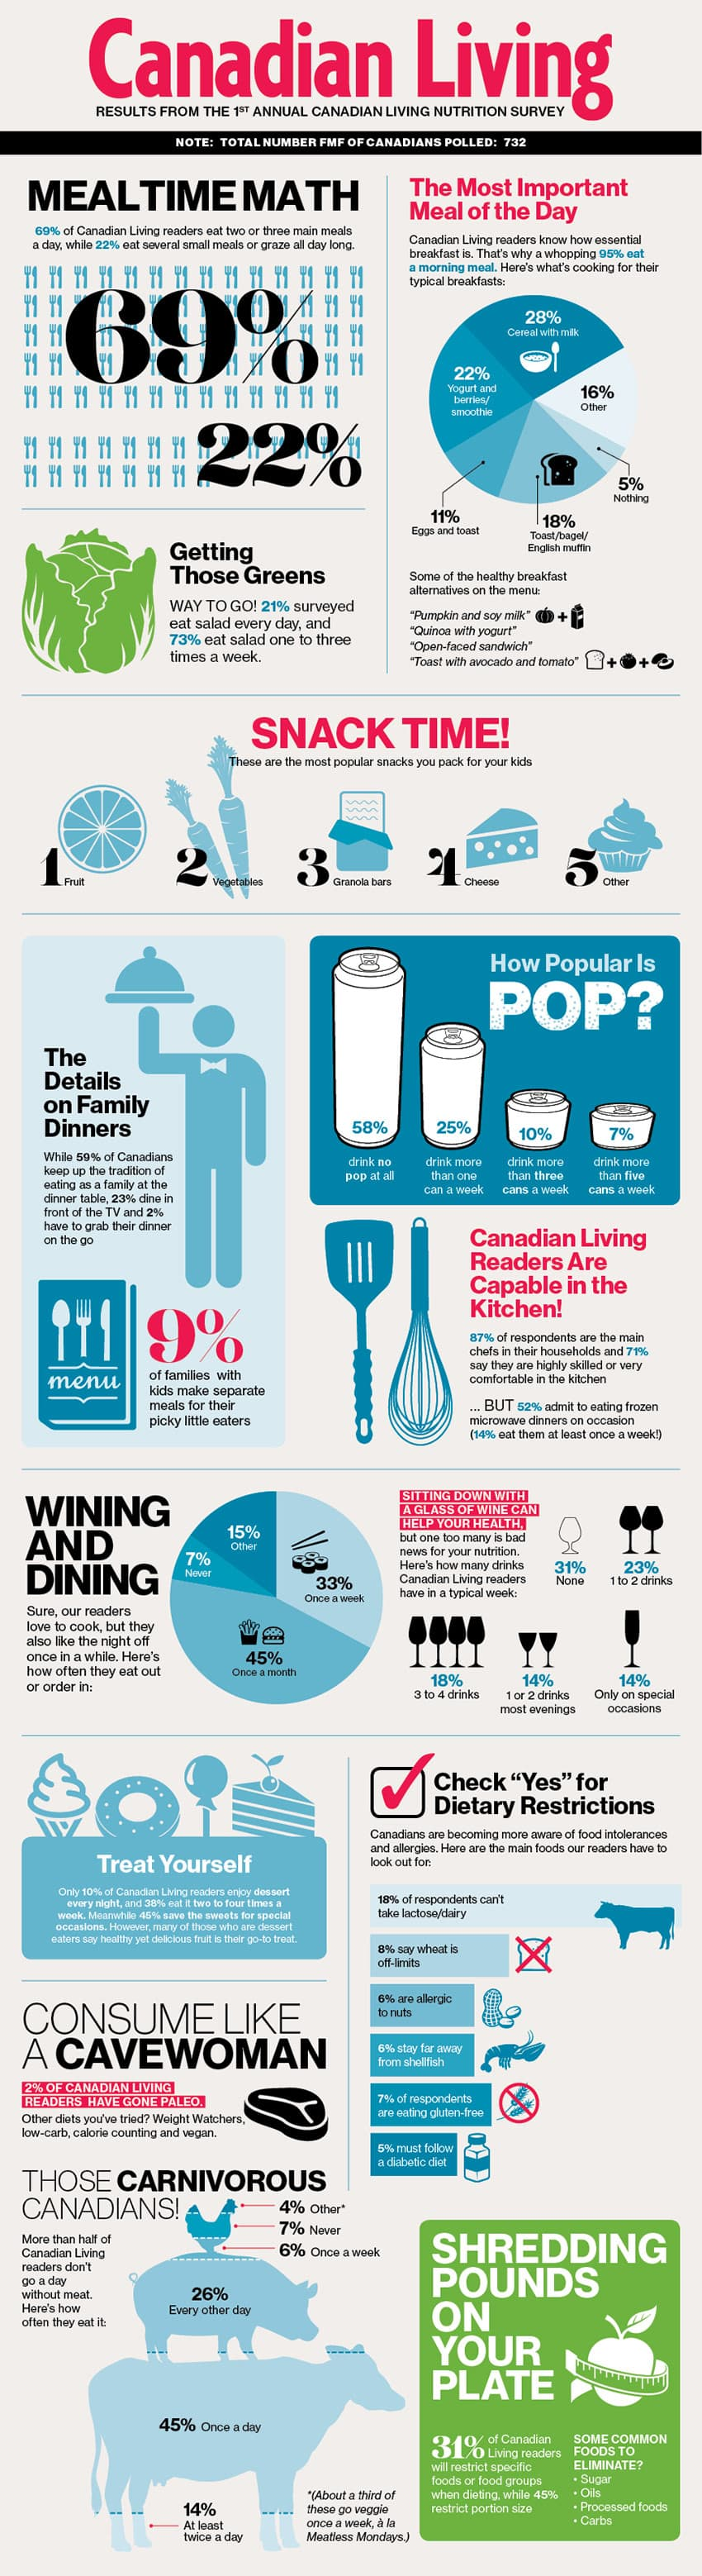 2013 Canadian Living Nutrition Survey